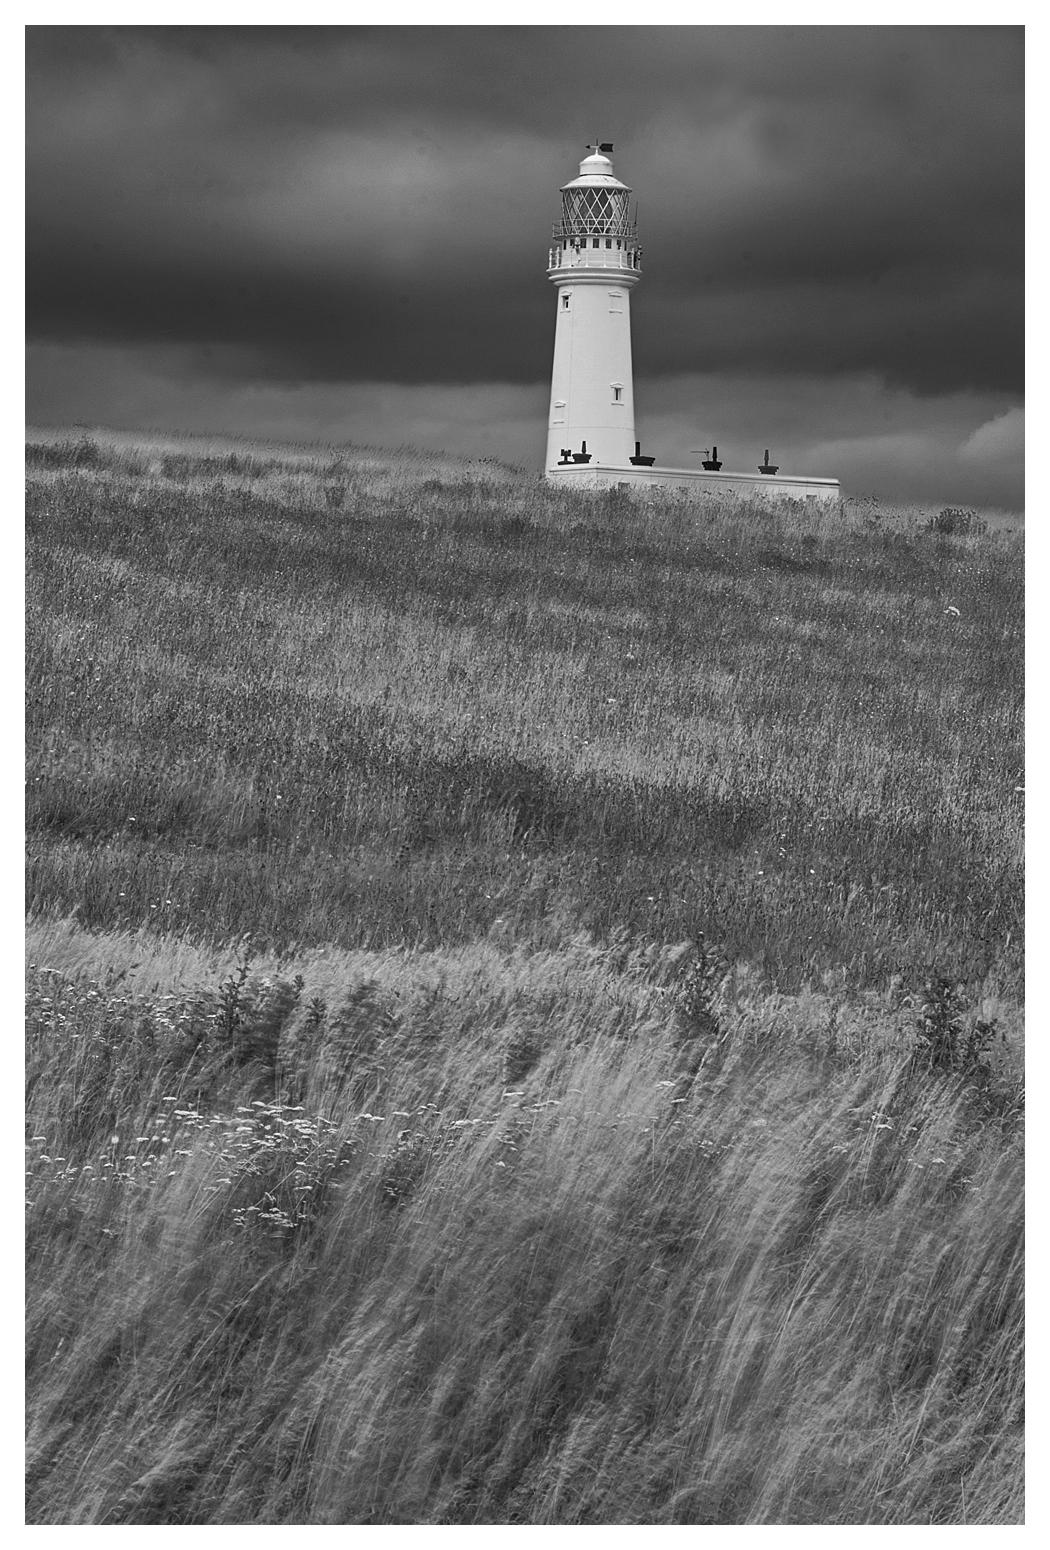 grasses at Flamborough lighthouse